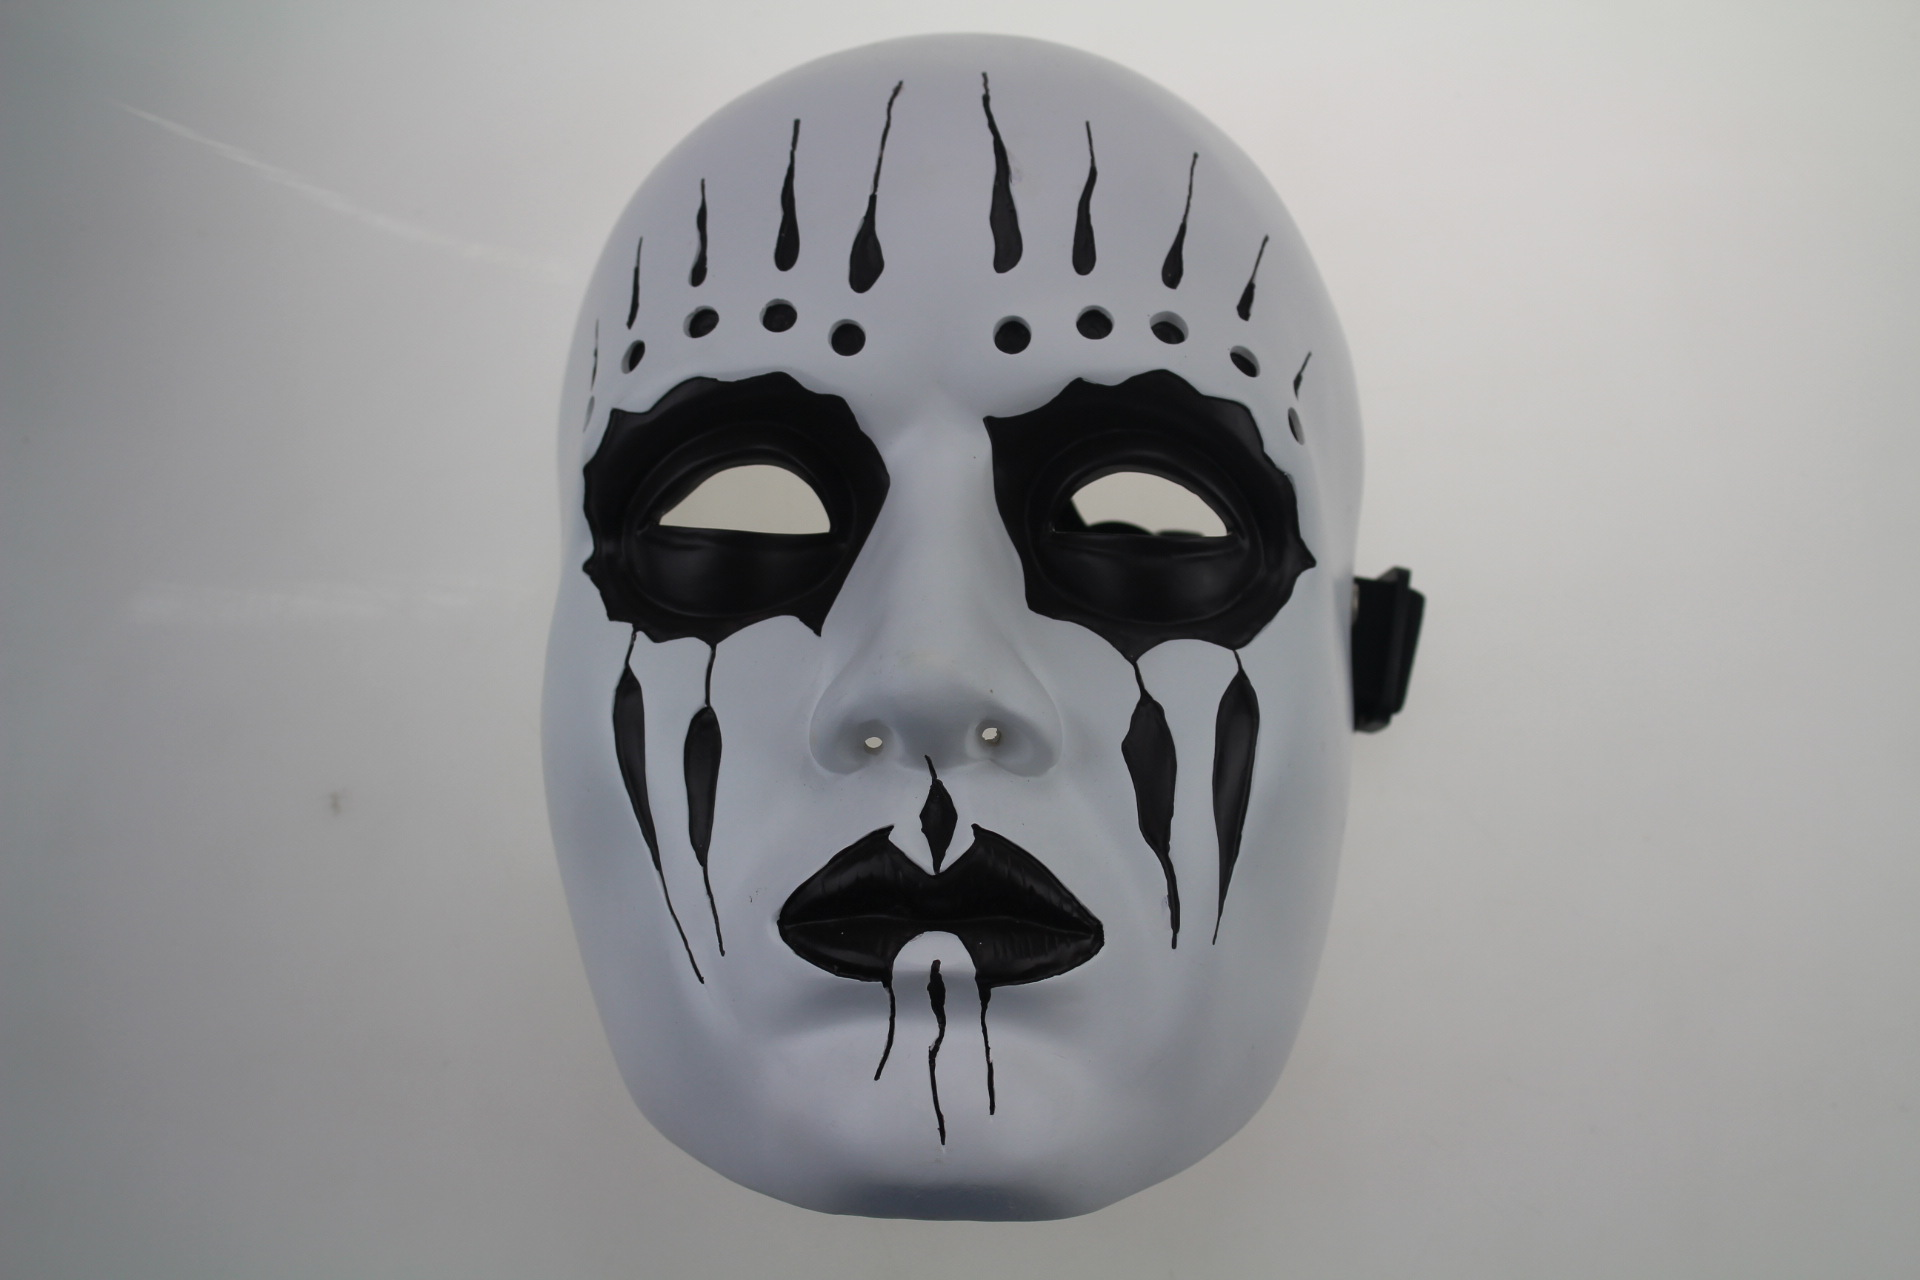 Guangdong mask manufacturers wholesale resin mask New slipknot drummer mask